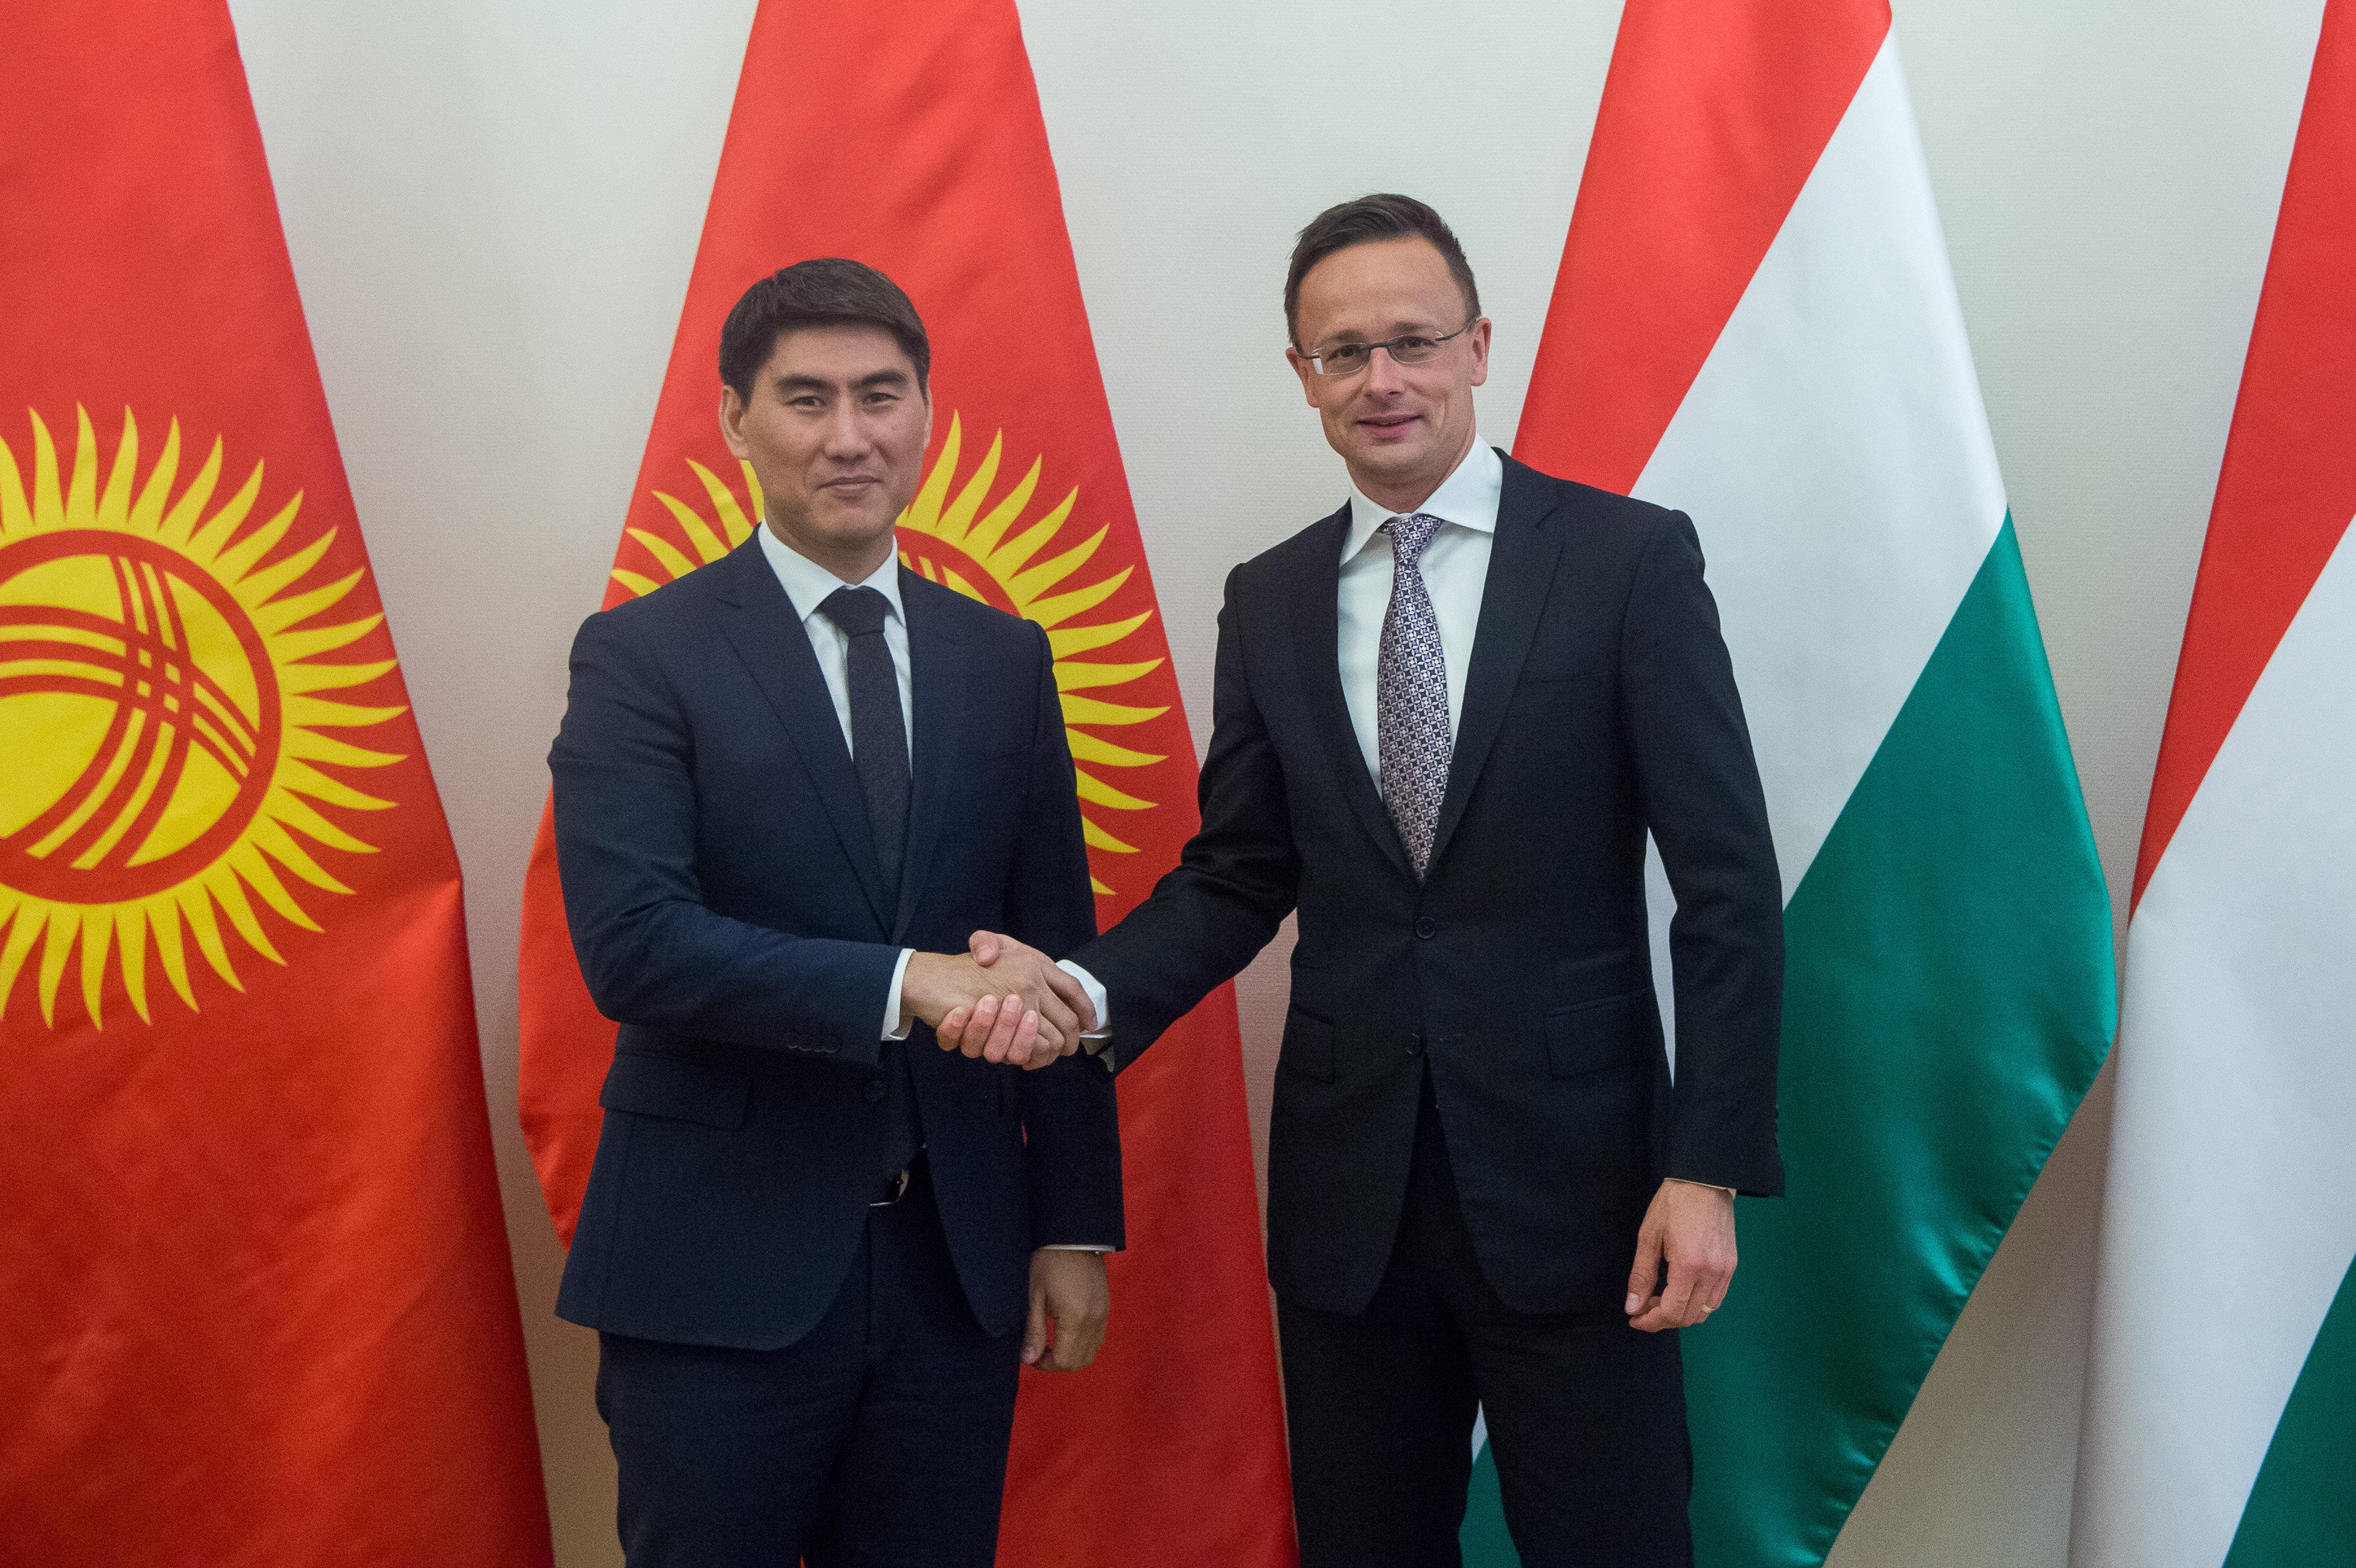 hungary kyrgyzstan